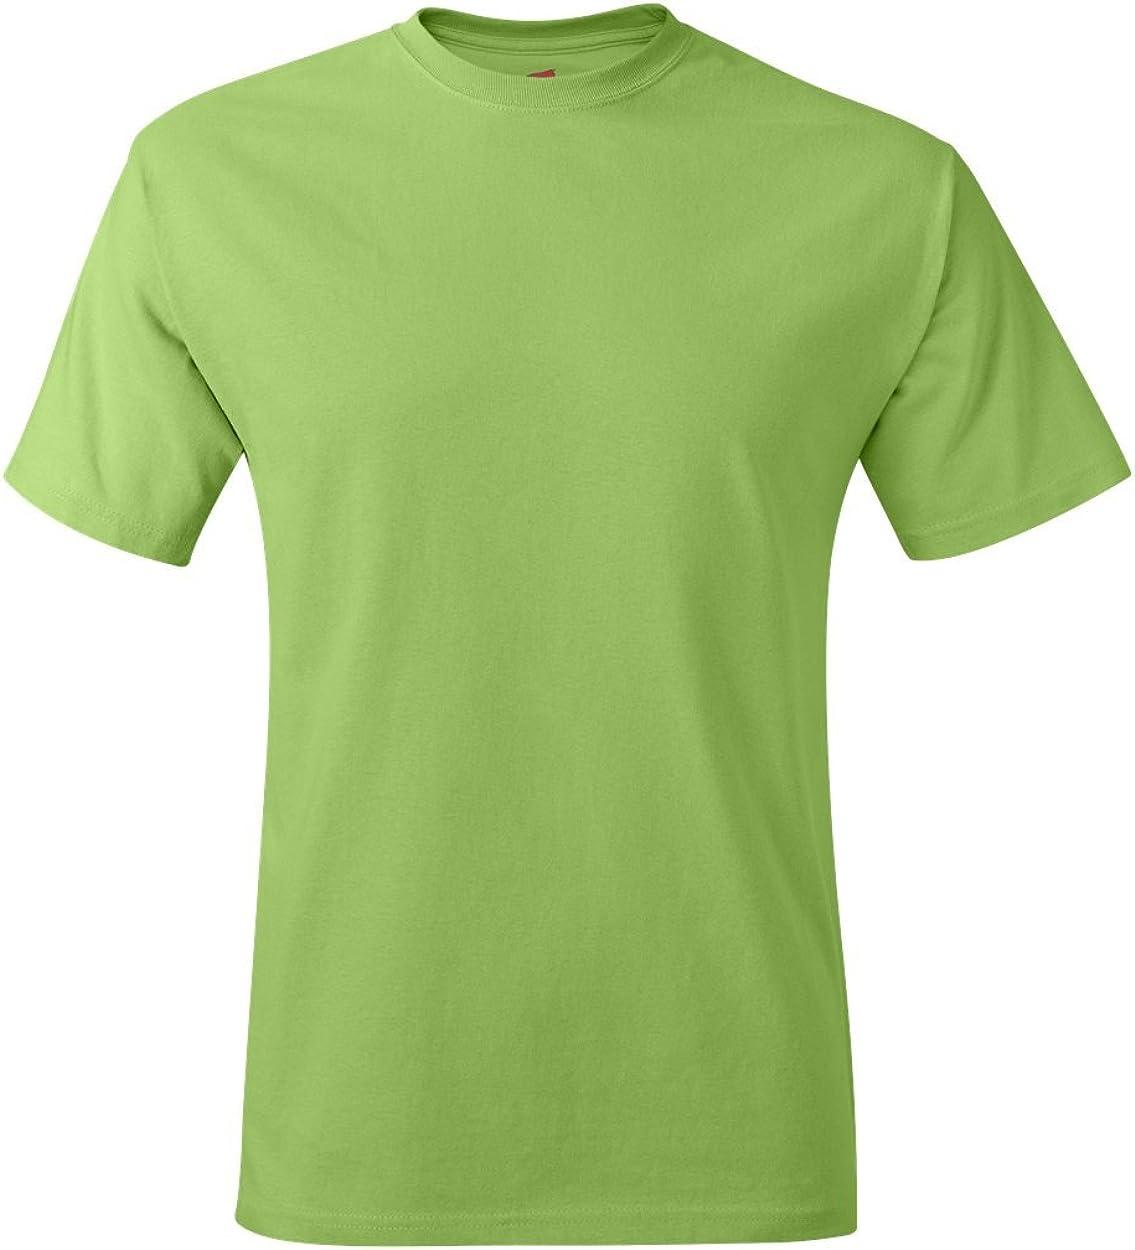 Hanes Tagless 100% Cotton T-Shirt